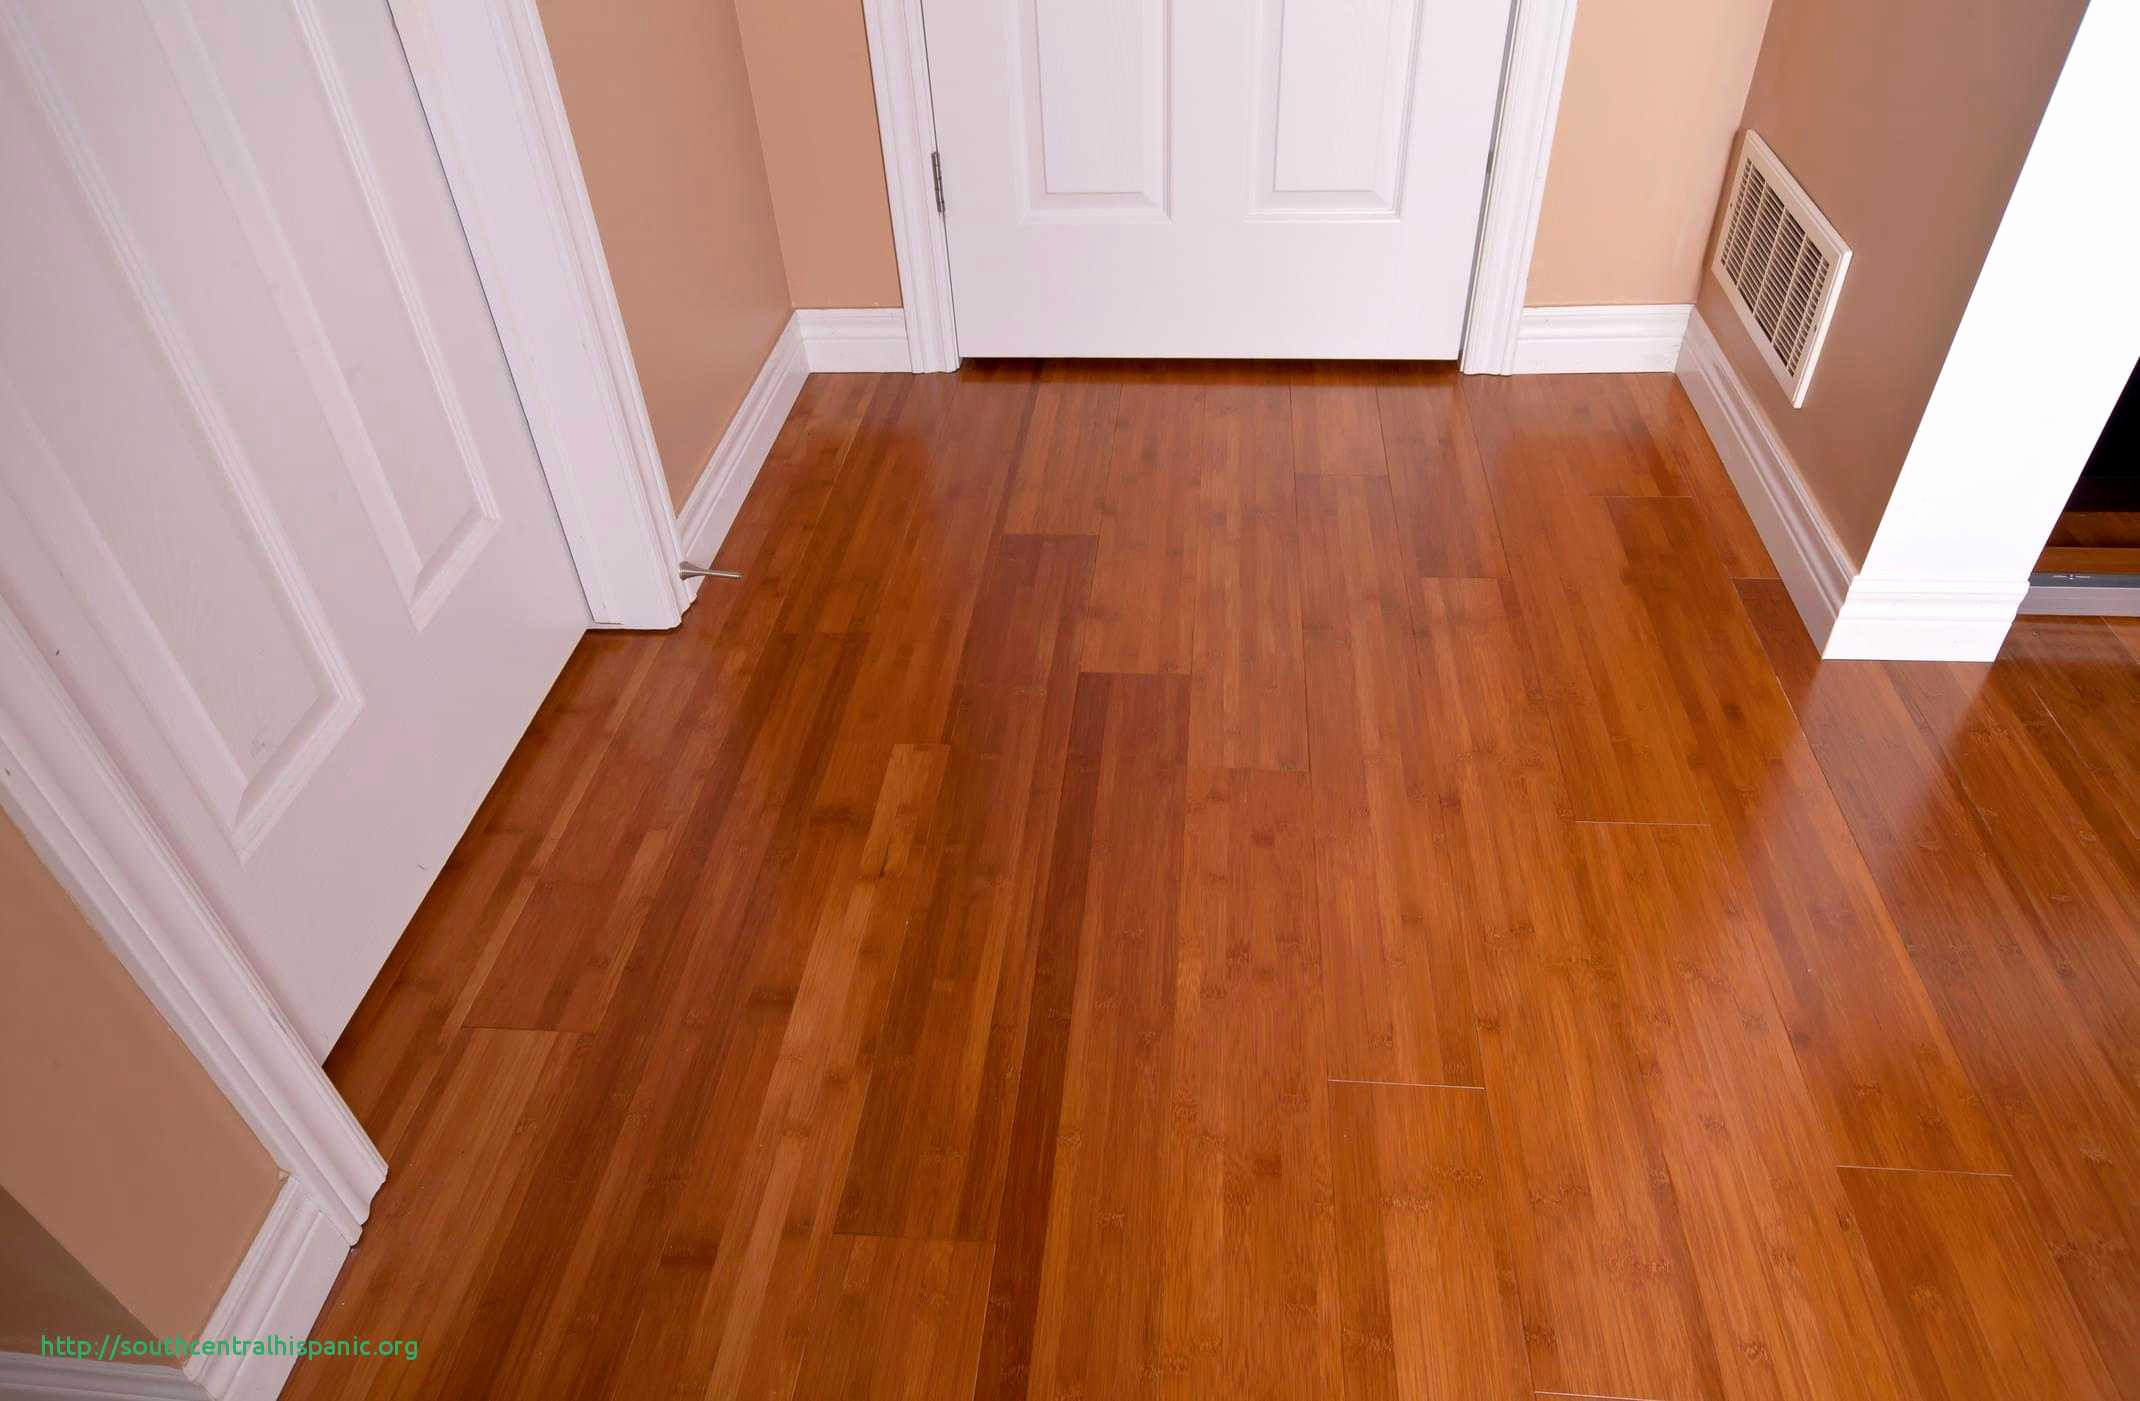 prefinished hardwood flooring charlotte nc of 28 unique 50 floor charlotte nc wlcu in 50 floor charlotte nc elegant 20 nouveau trewax floor wax 50 floor charlotte nc